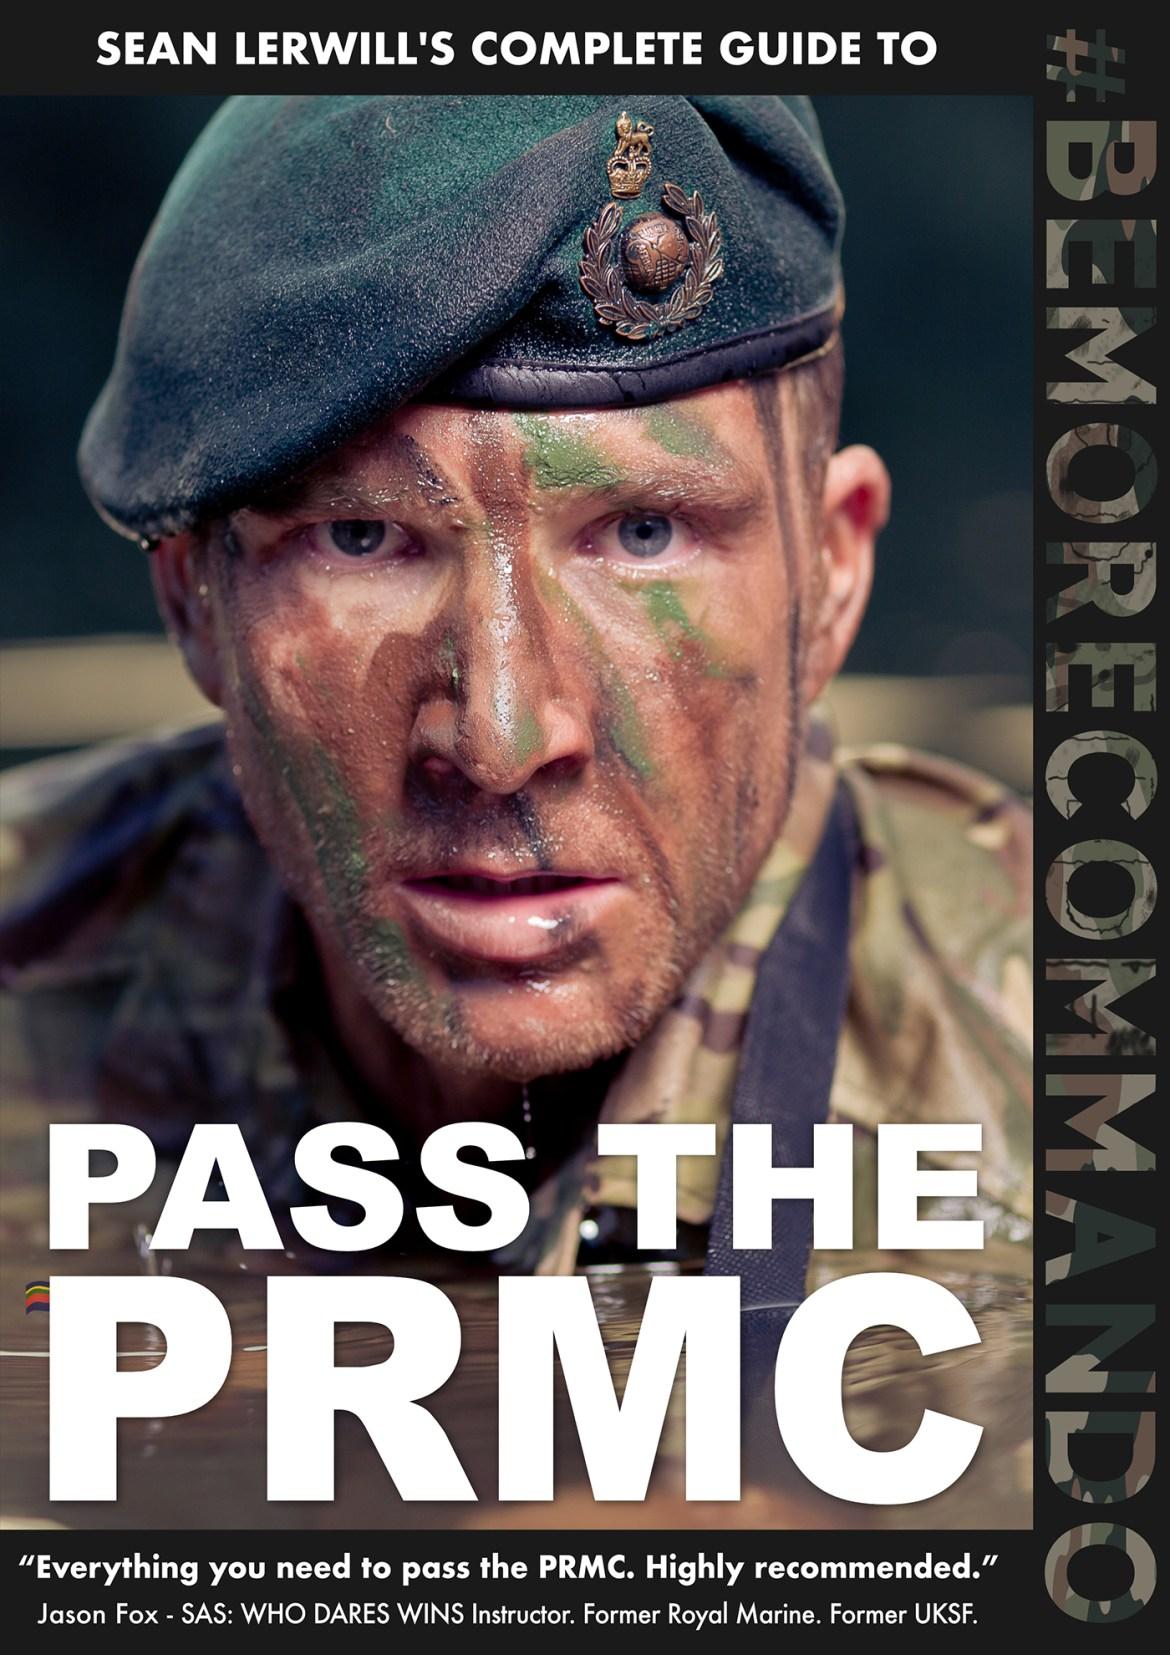 Pass the PRMC